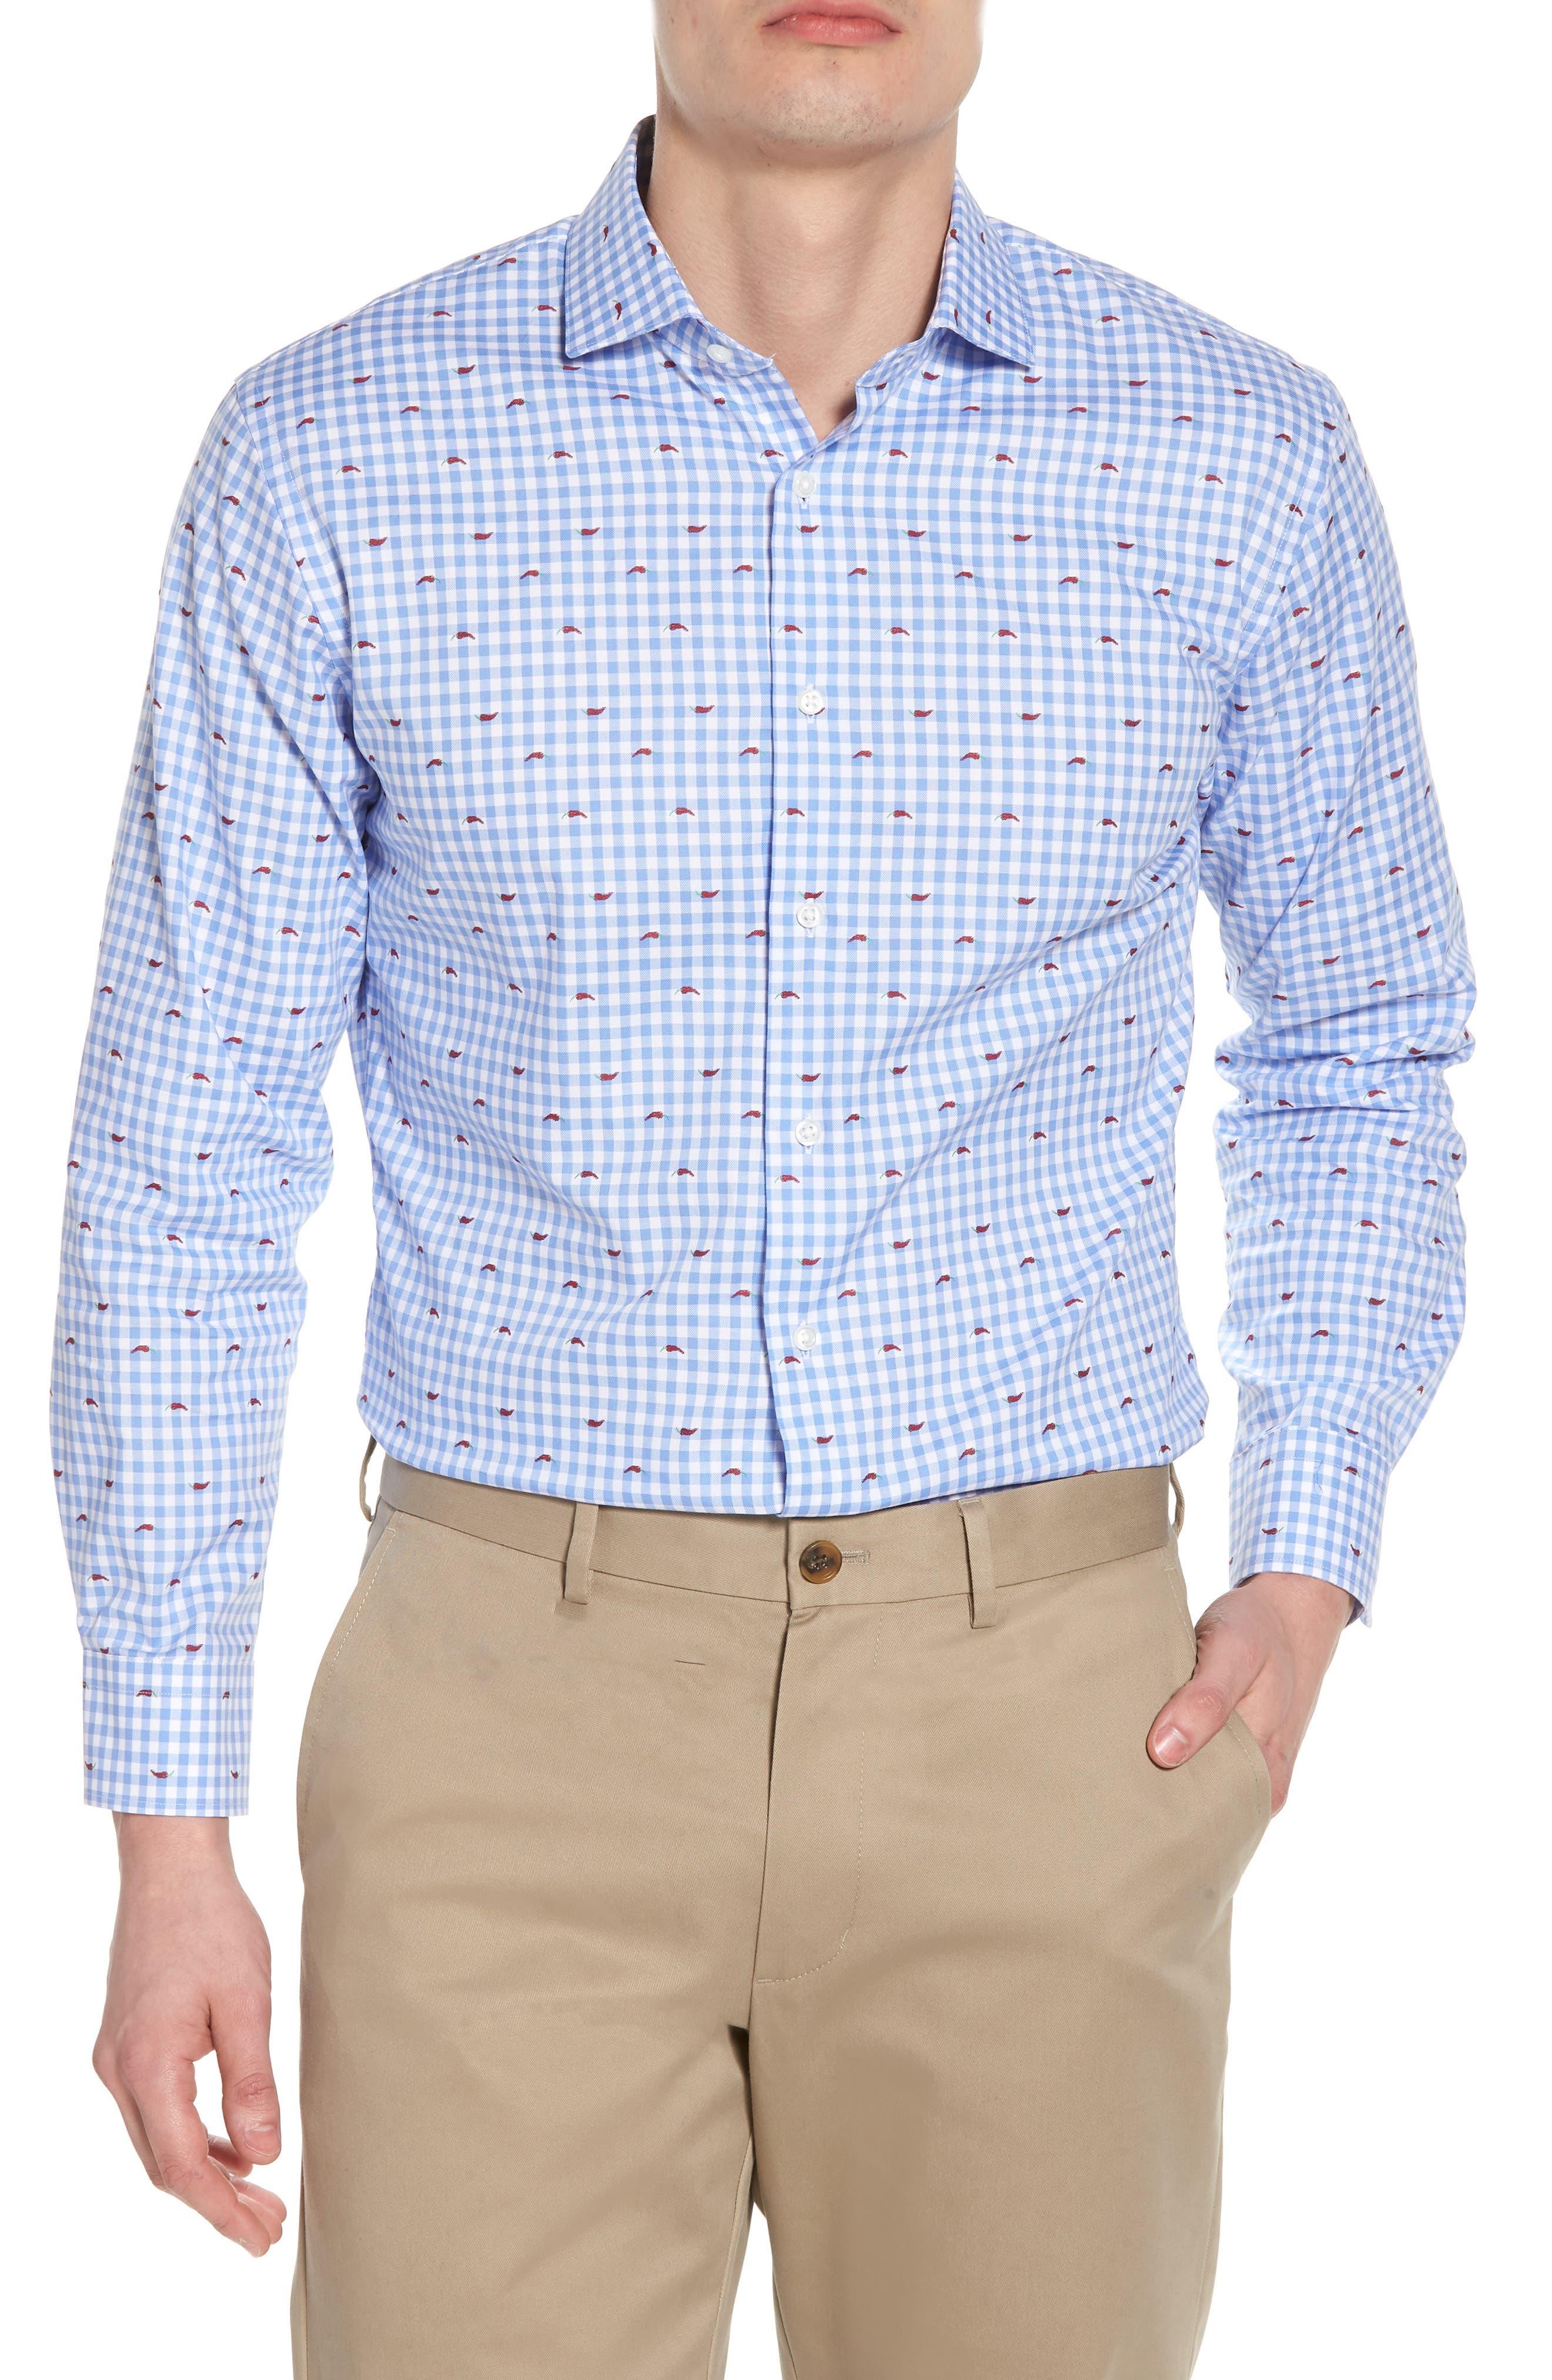 Nordstrom Men's Shop Trim Fit Gingham Chili Pepper Dress Shirt